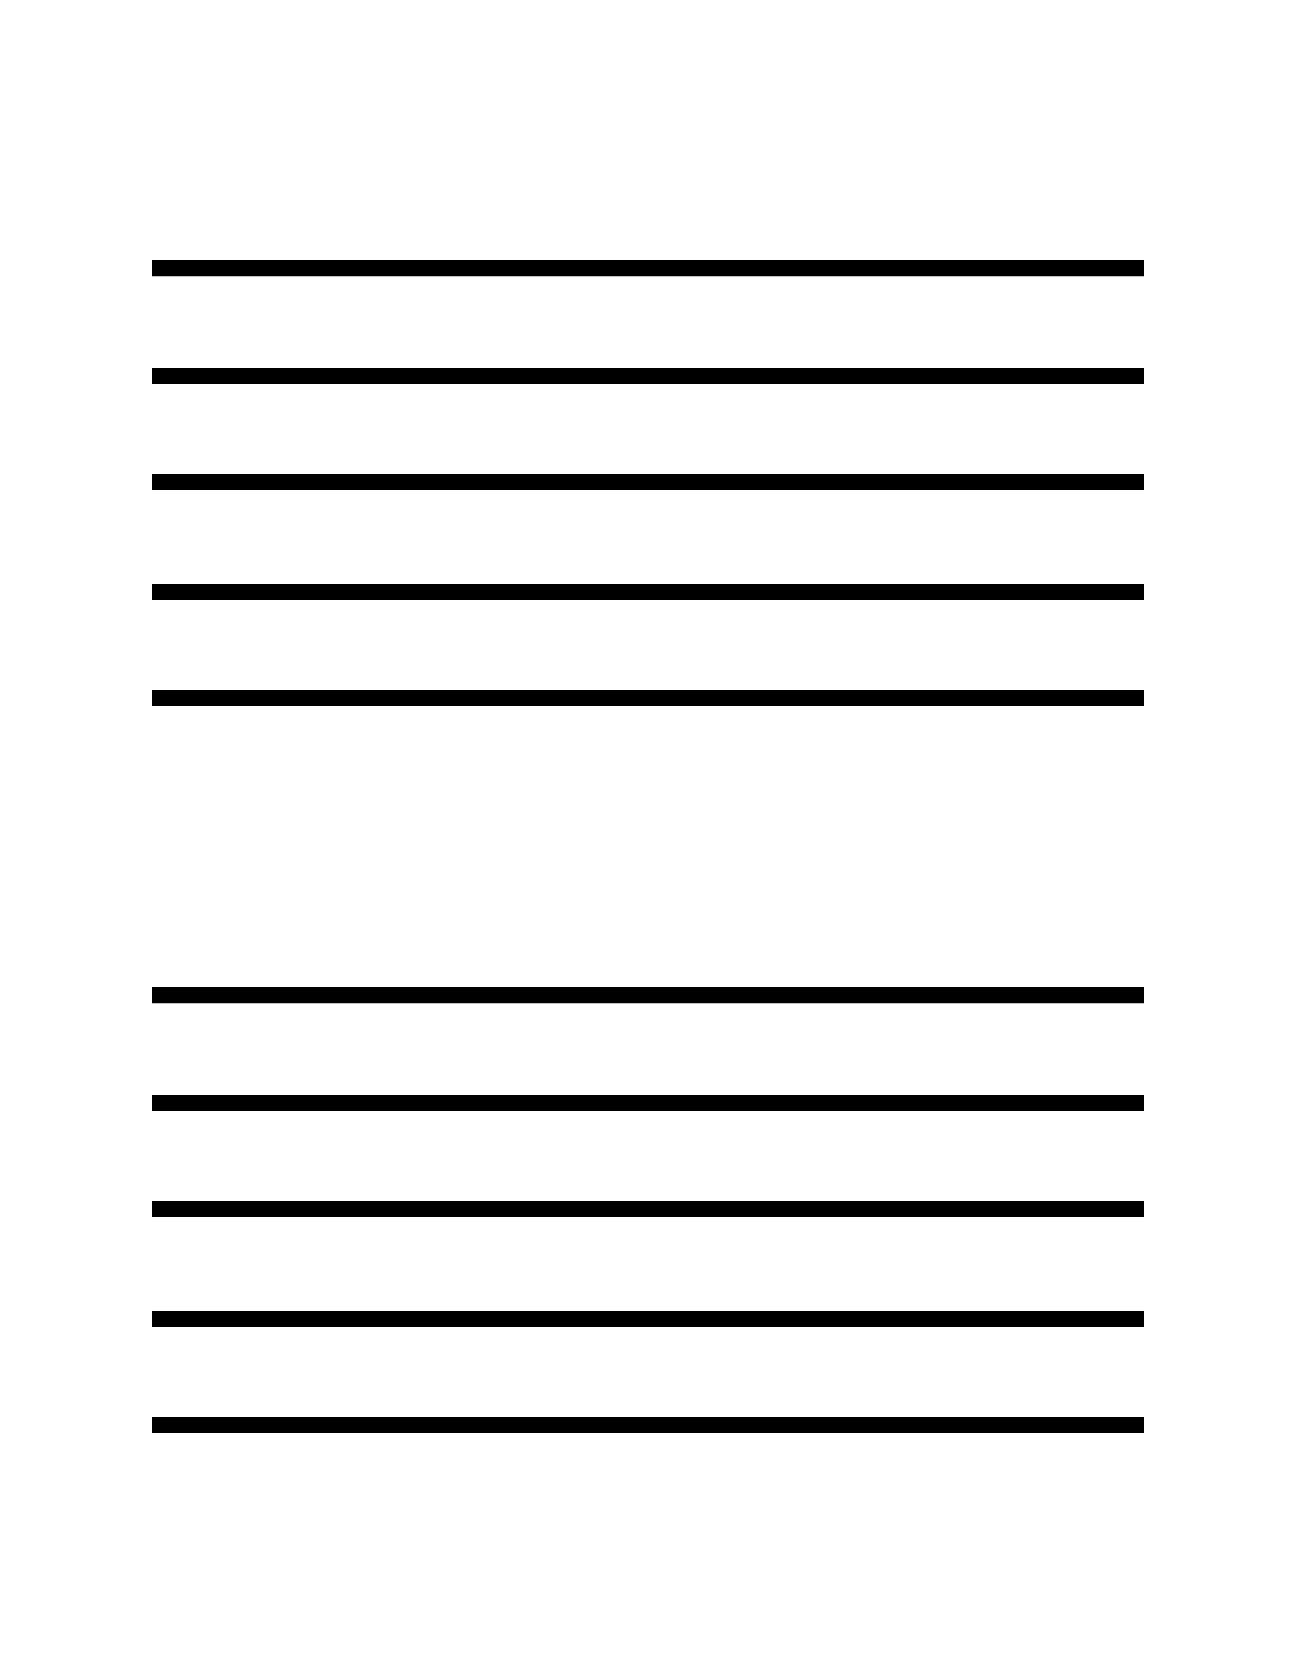 Printable Staff Treble Clef Music Paper Music Paper Blank Sheet Music Treble Clef